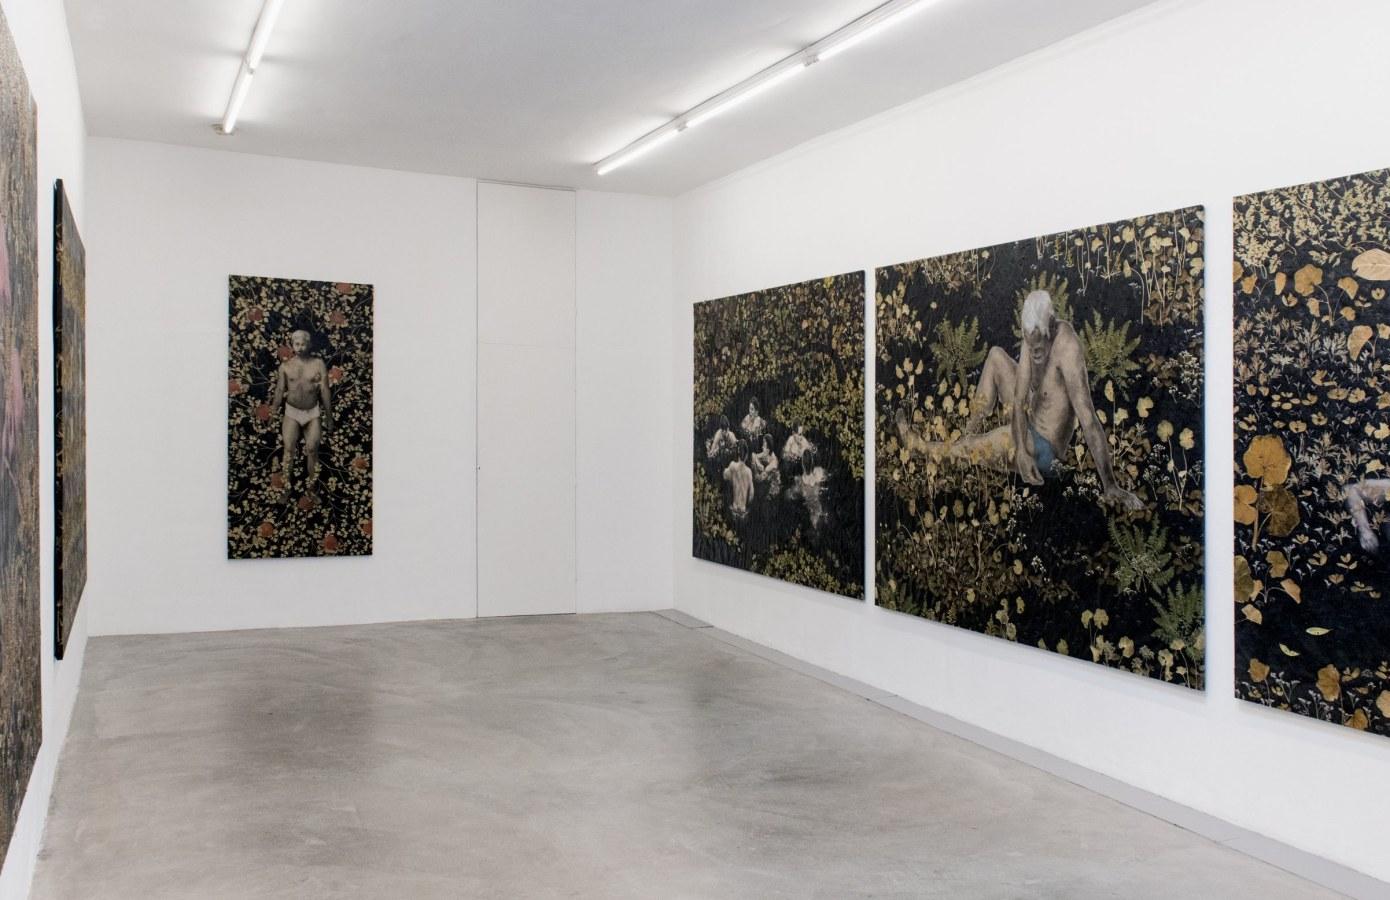 Luis Xertu – Renditions of Impermanence, Luis Xertu,